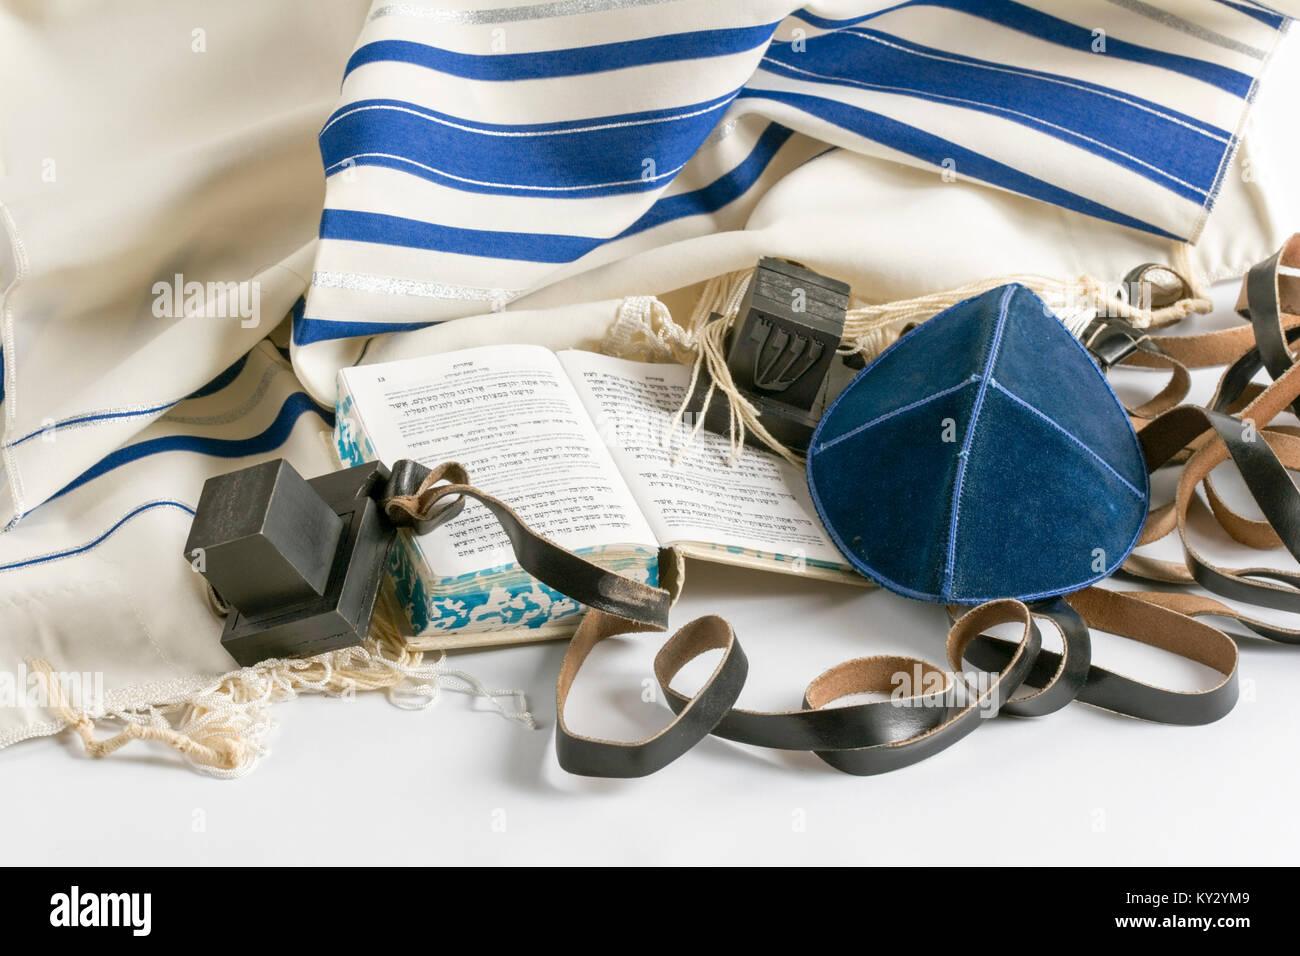 Teffilin, Talith and Sidur for Jewish ritual - Stock Image